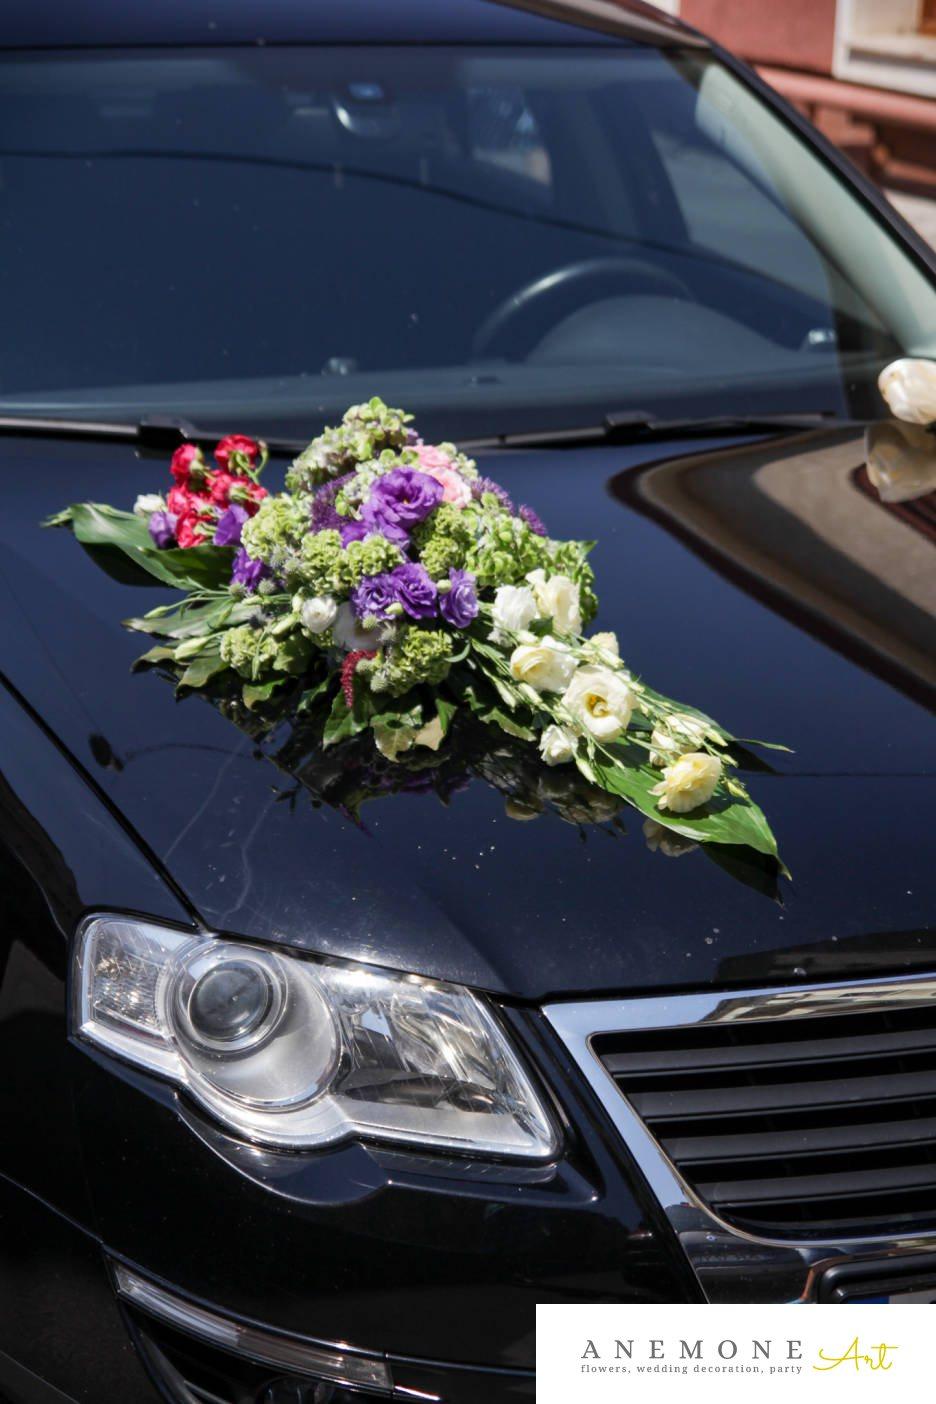 Poza, foto cu Flori de nunta alb, asimetric, decor masina, lisianthus, mov, rosu, trandafiri in Arad, Timisoara, Oradea (wedding flowers, bouquets) nunta Arad, Timisoara, Oradea